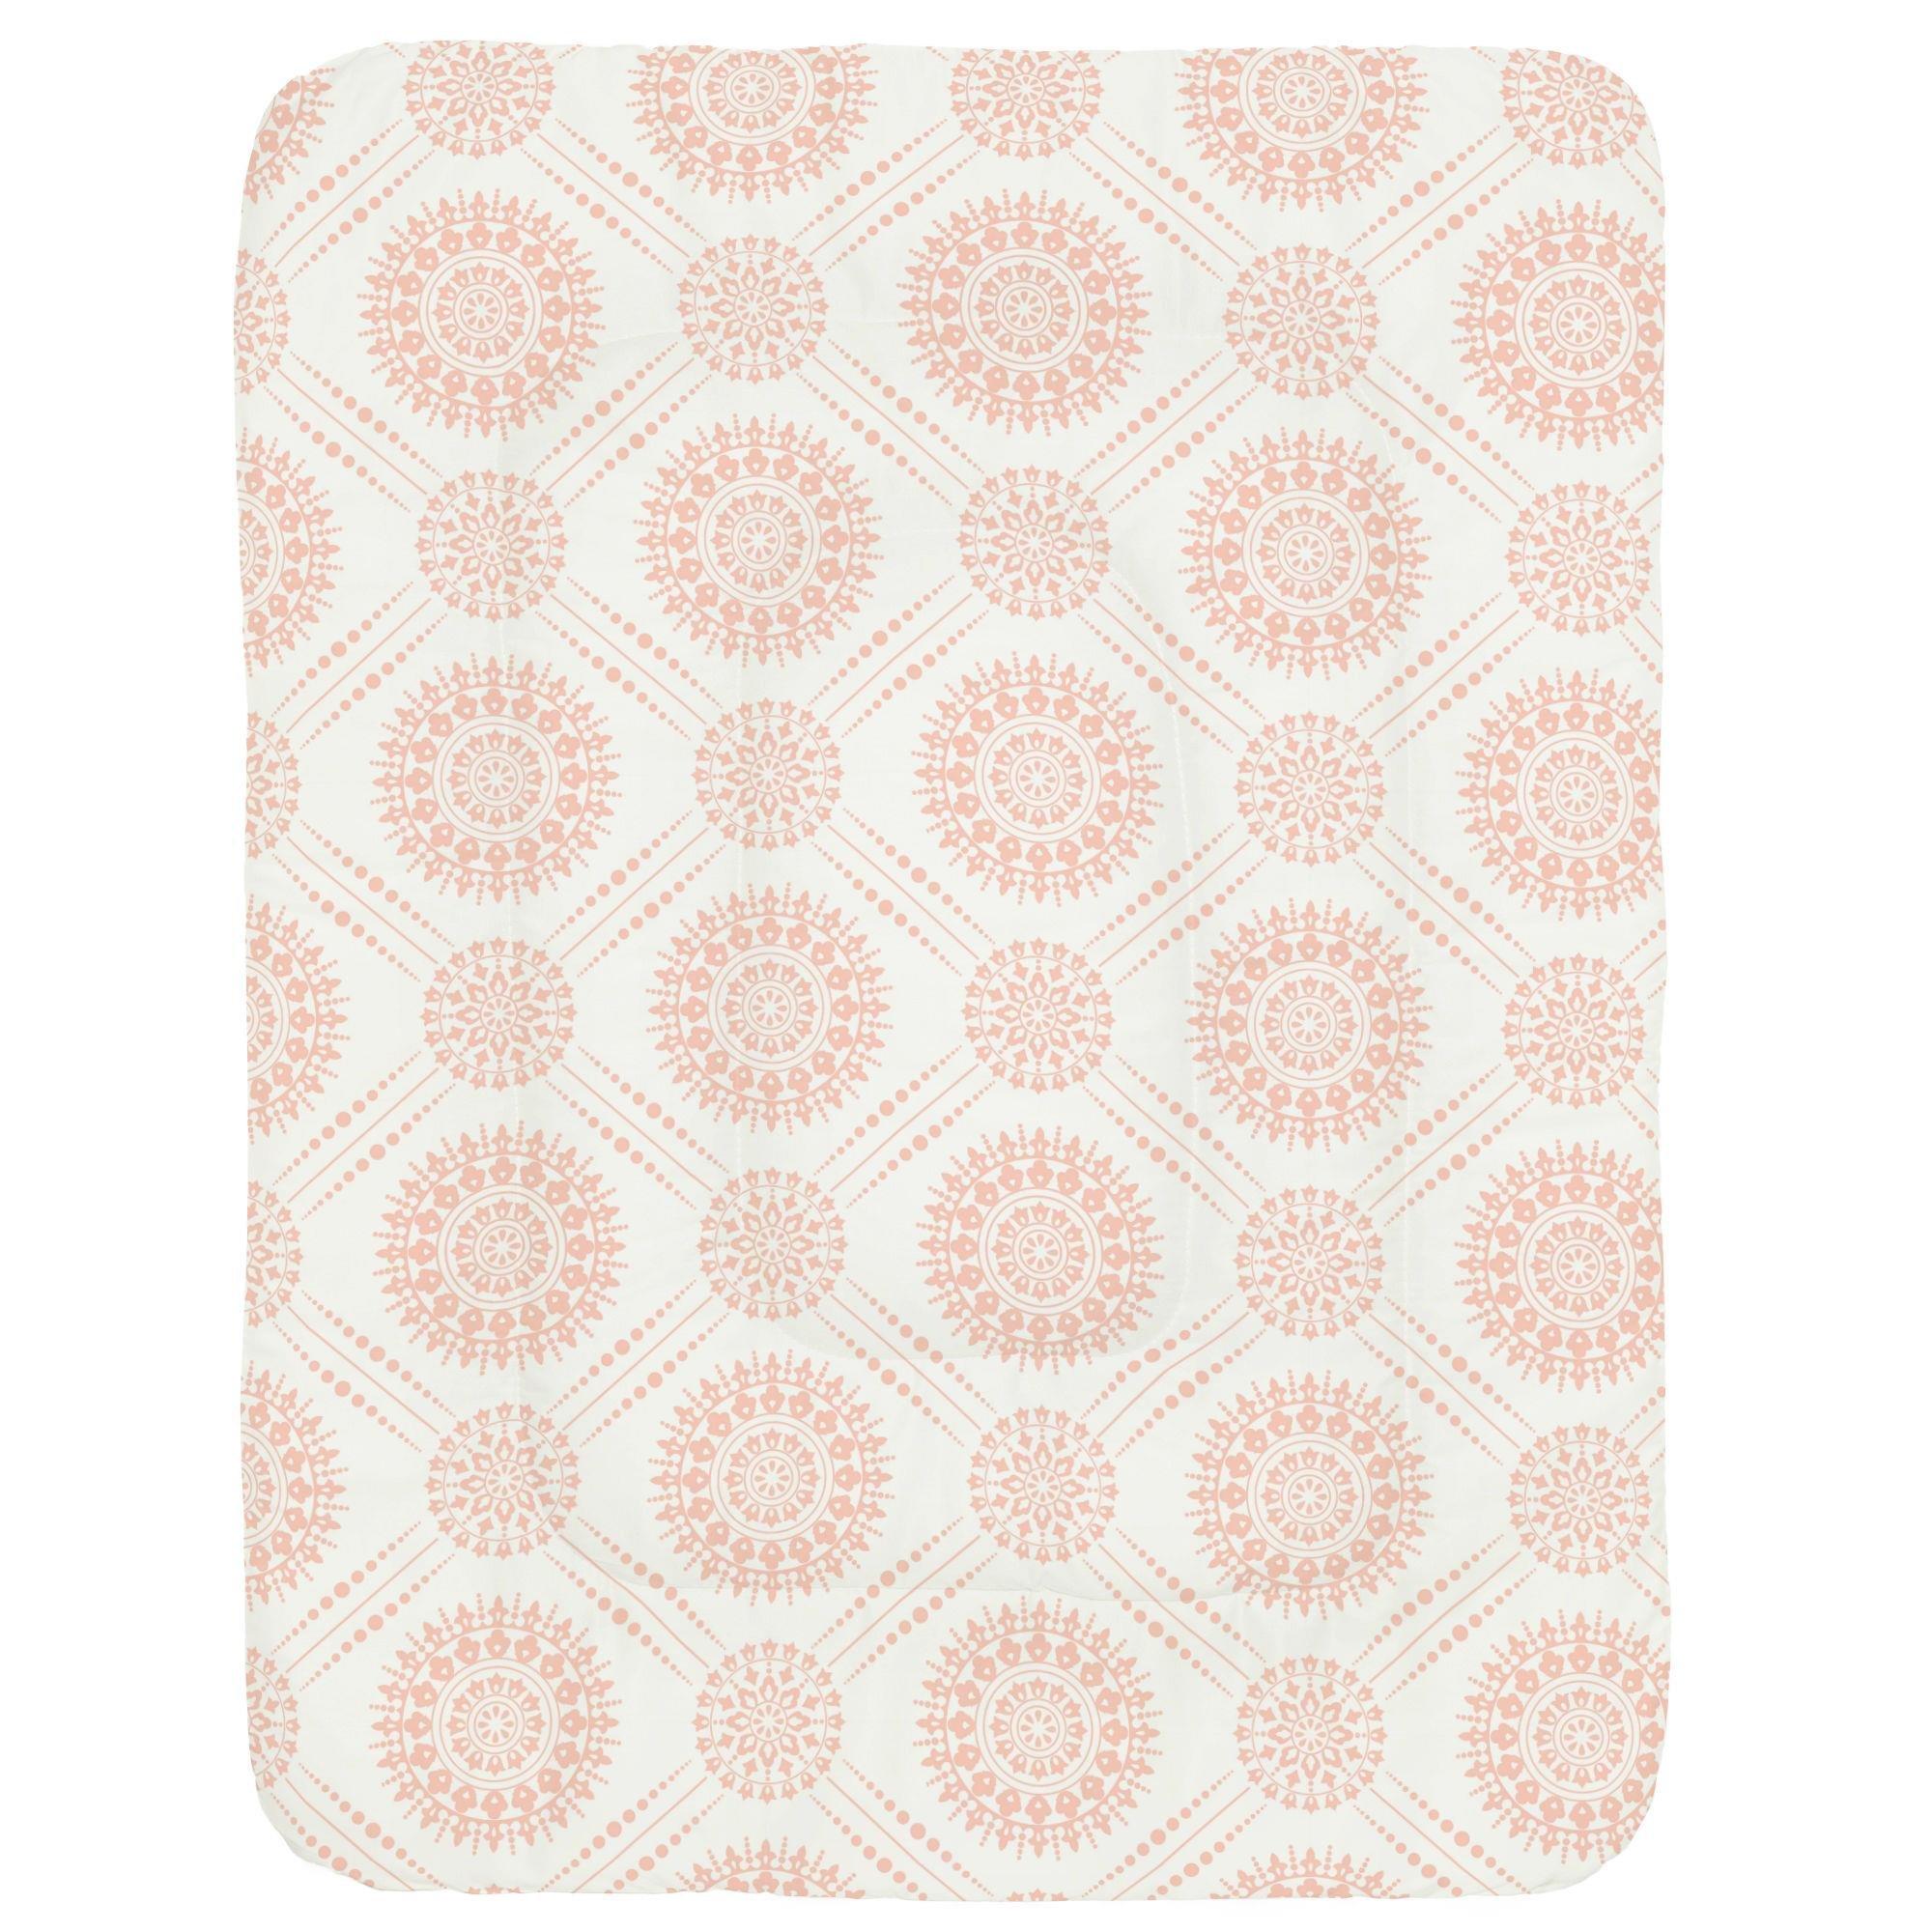 Carousel Designs Peach Modern Medallion Crib Comforter